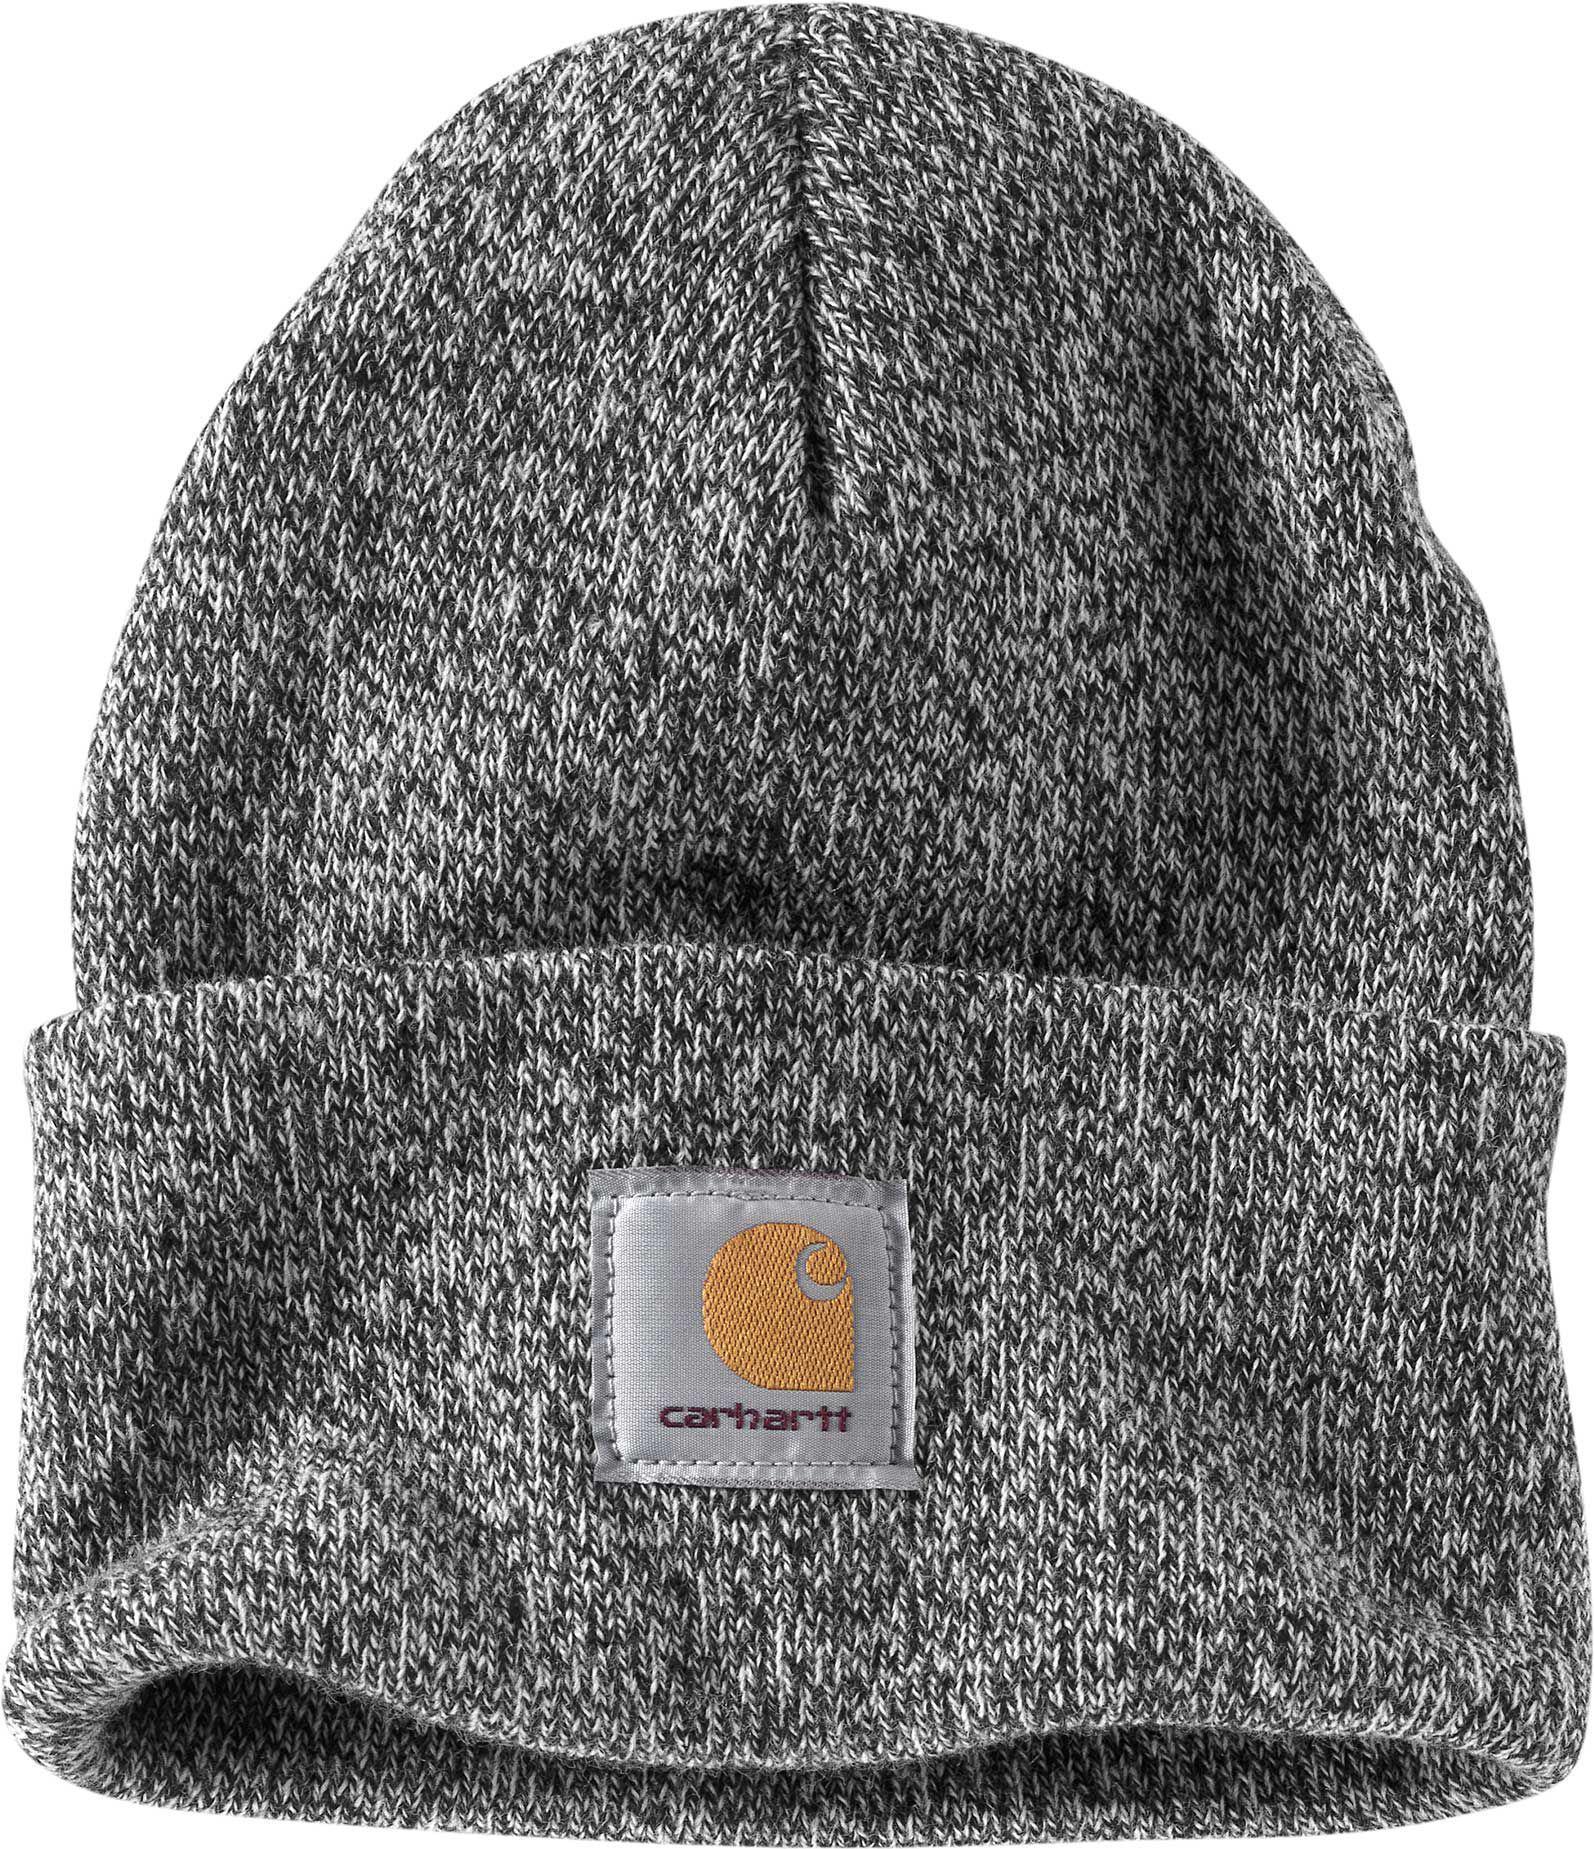 d33737bc234 View fullscreen · Carhartt - Black Knit Watch Cap for Men - Lyst